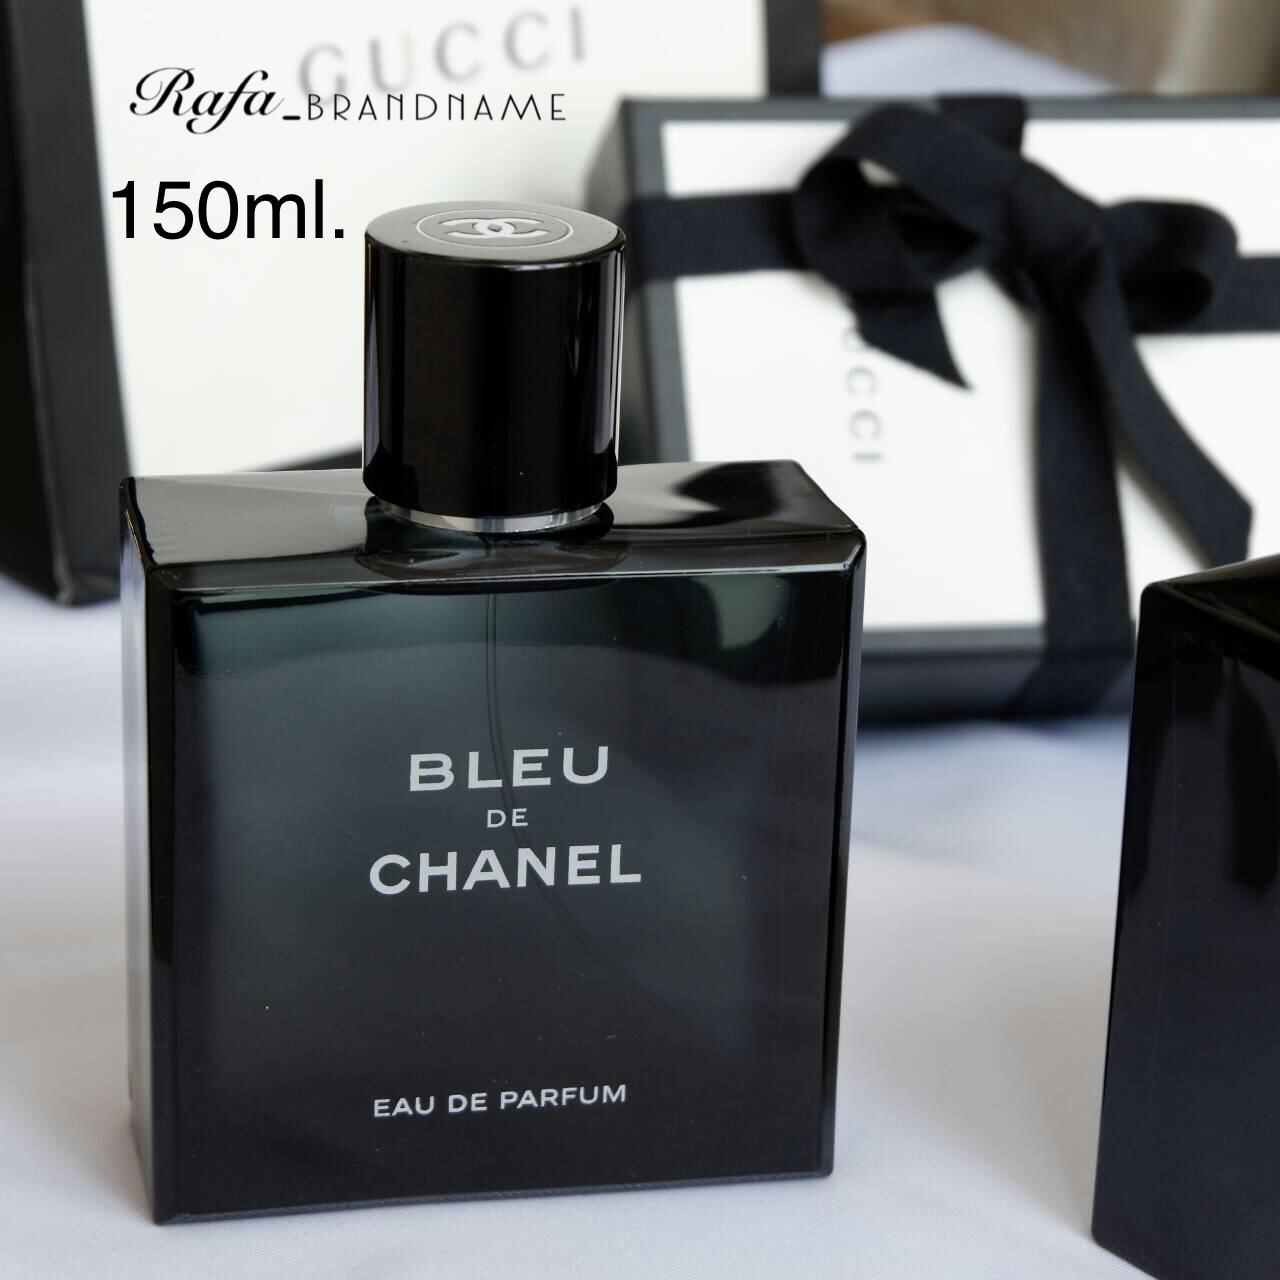 3baab8c6 น้ำหอม Chanel Bleu De Chanel Eau De Parfum 150 ml.